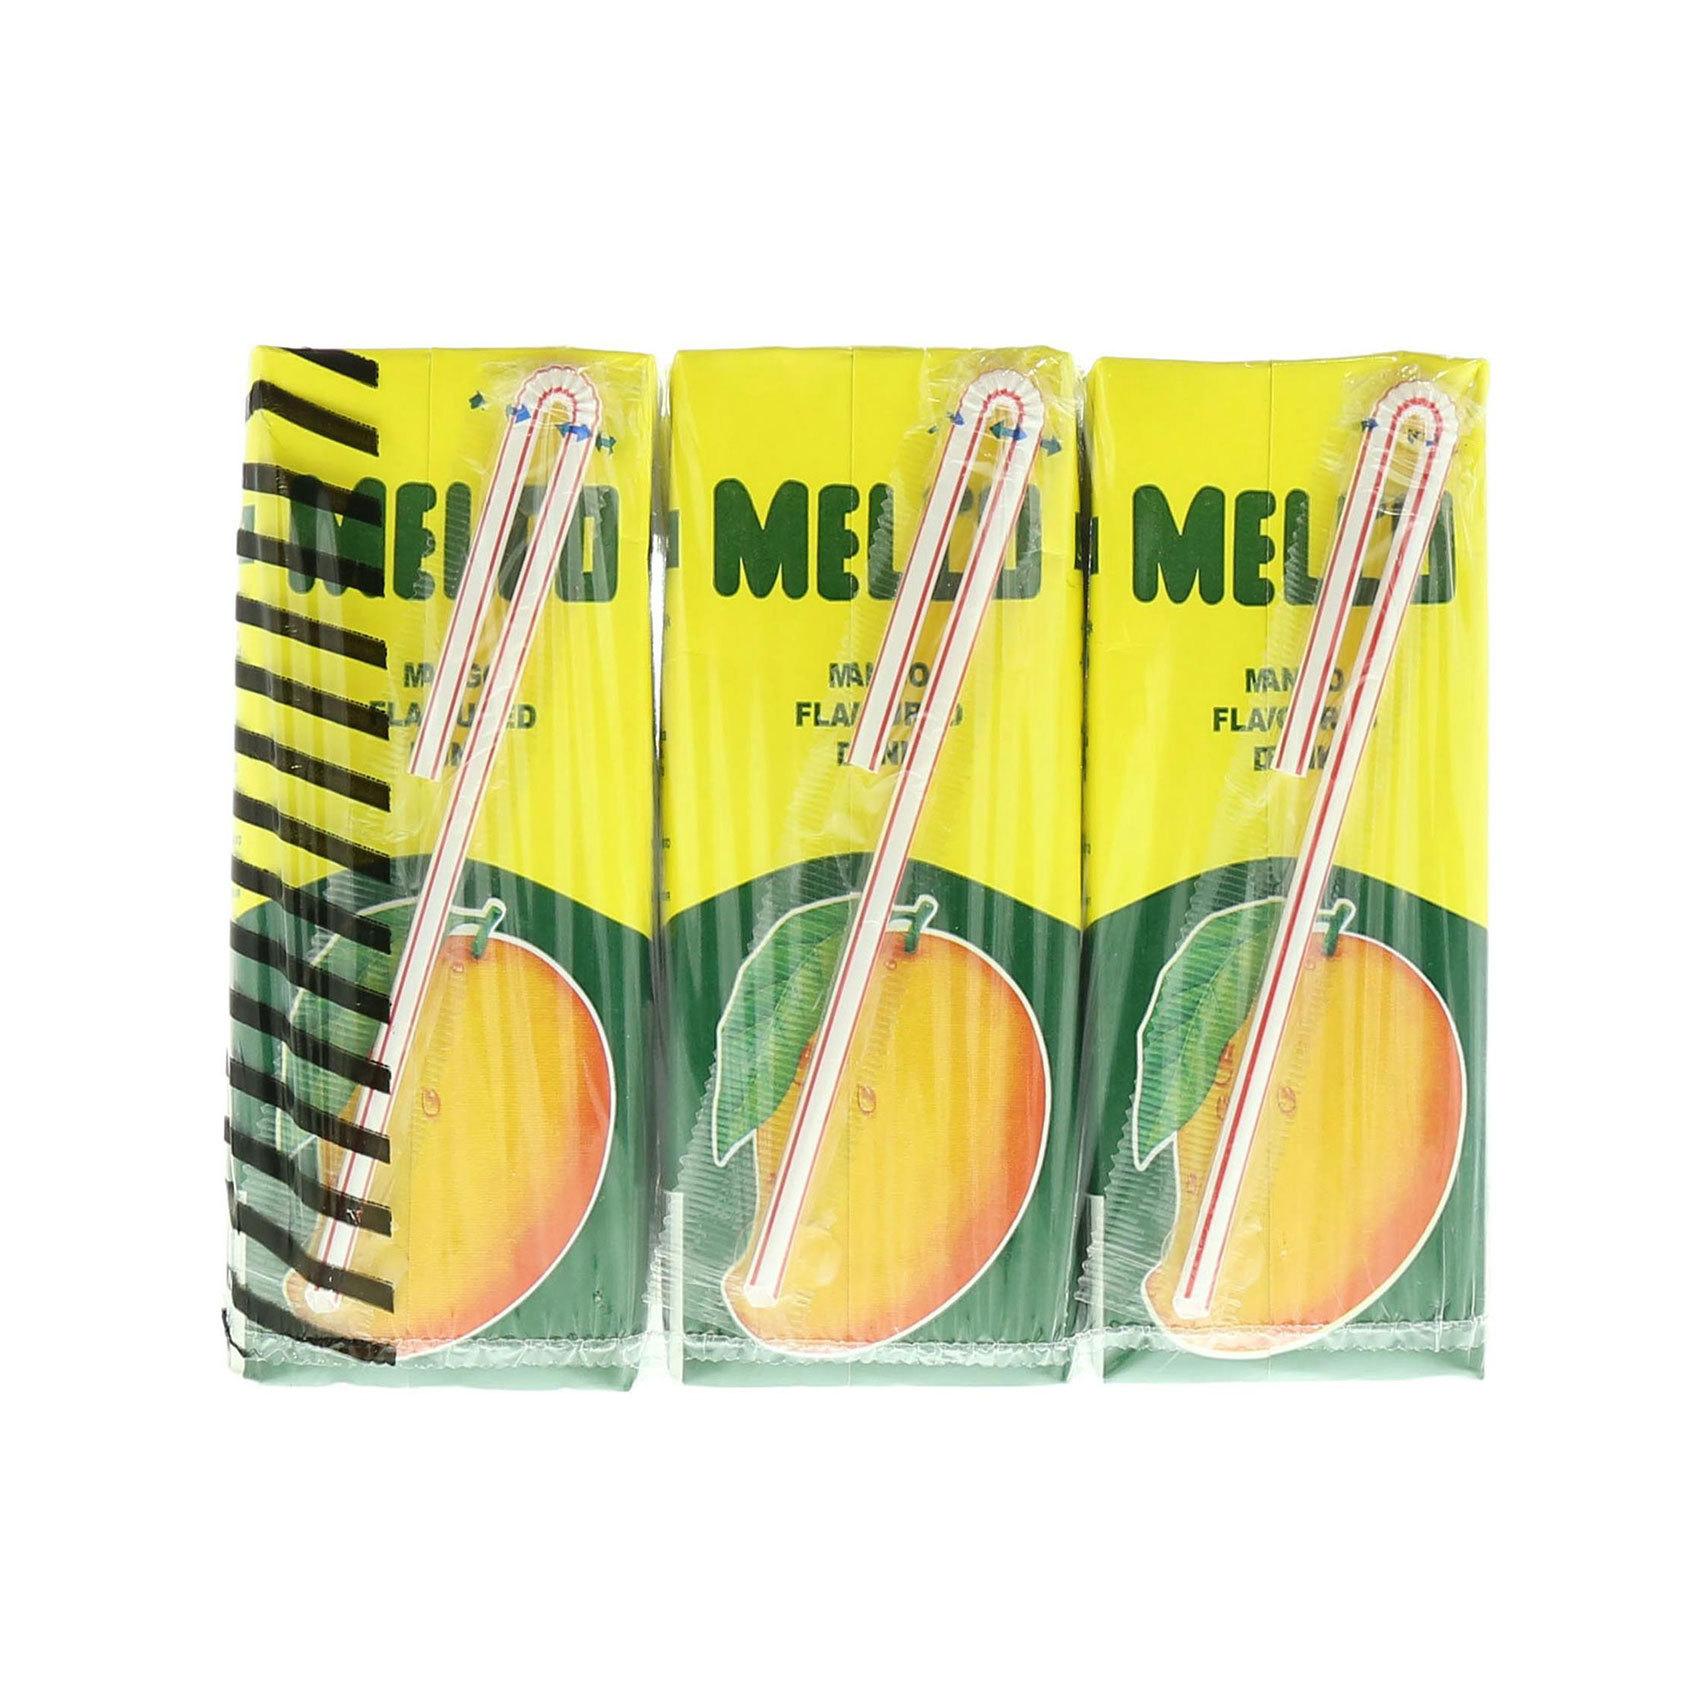 MILCO MANGO DRINK 250MLX9